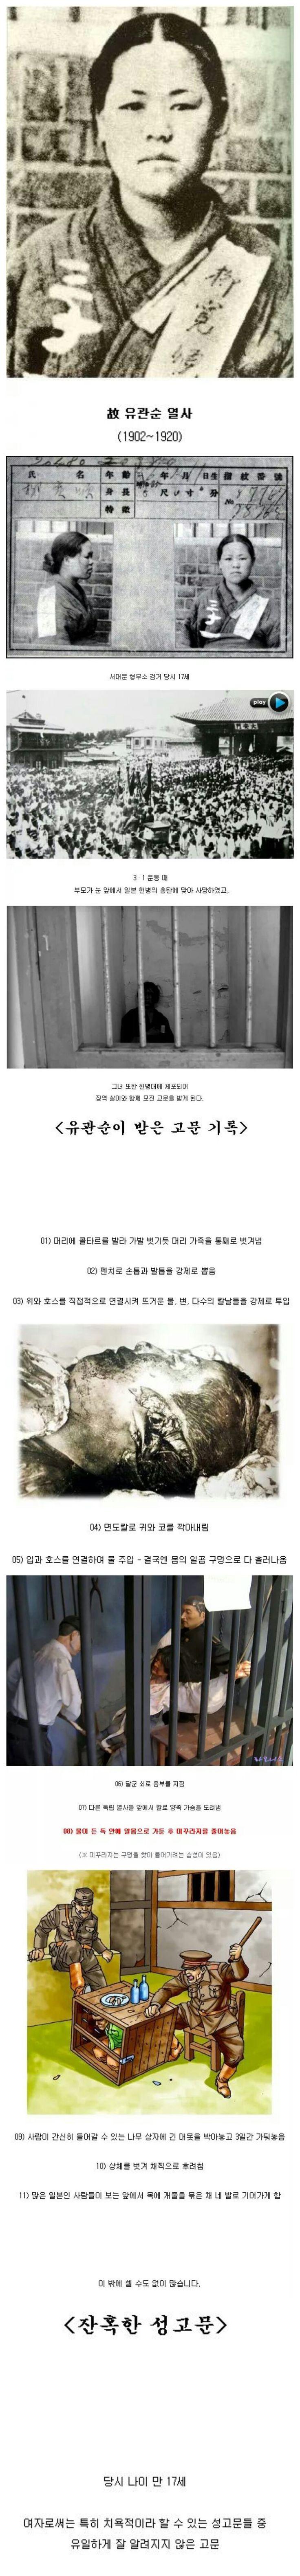 history of korea 2